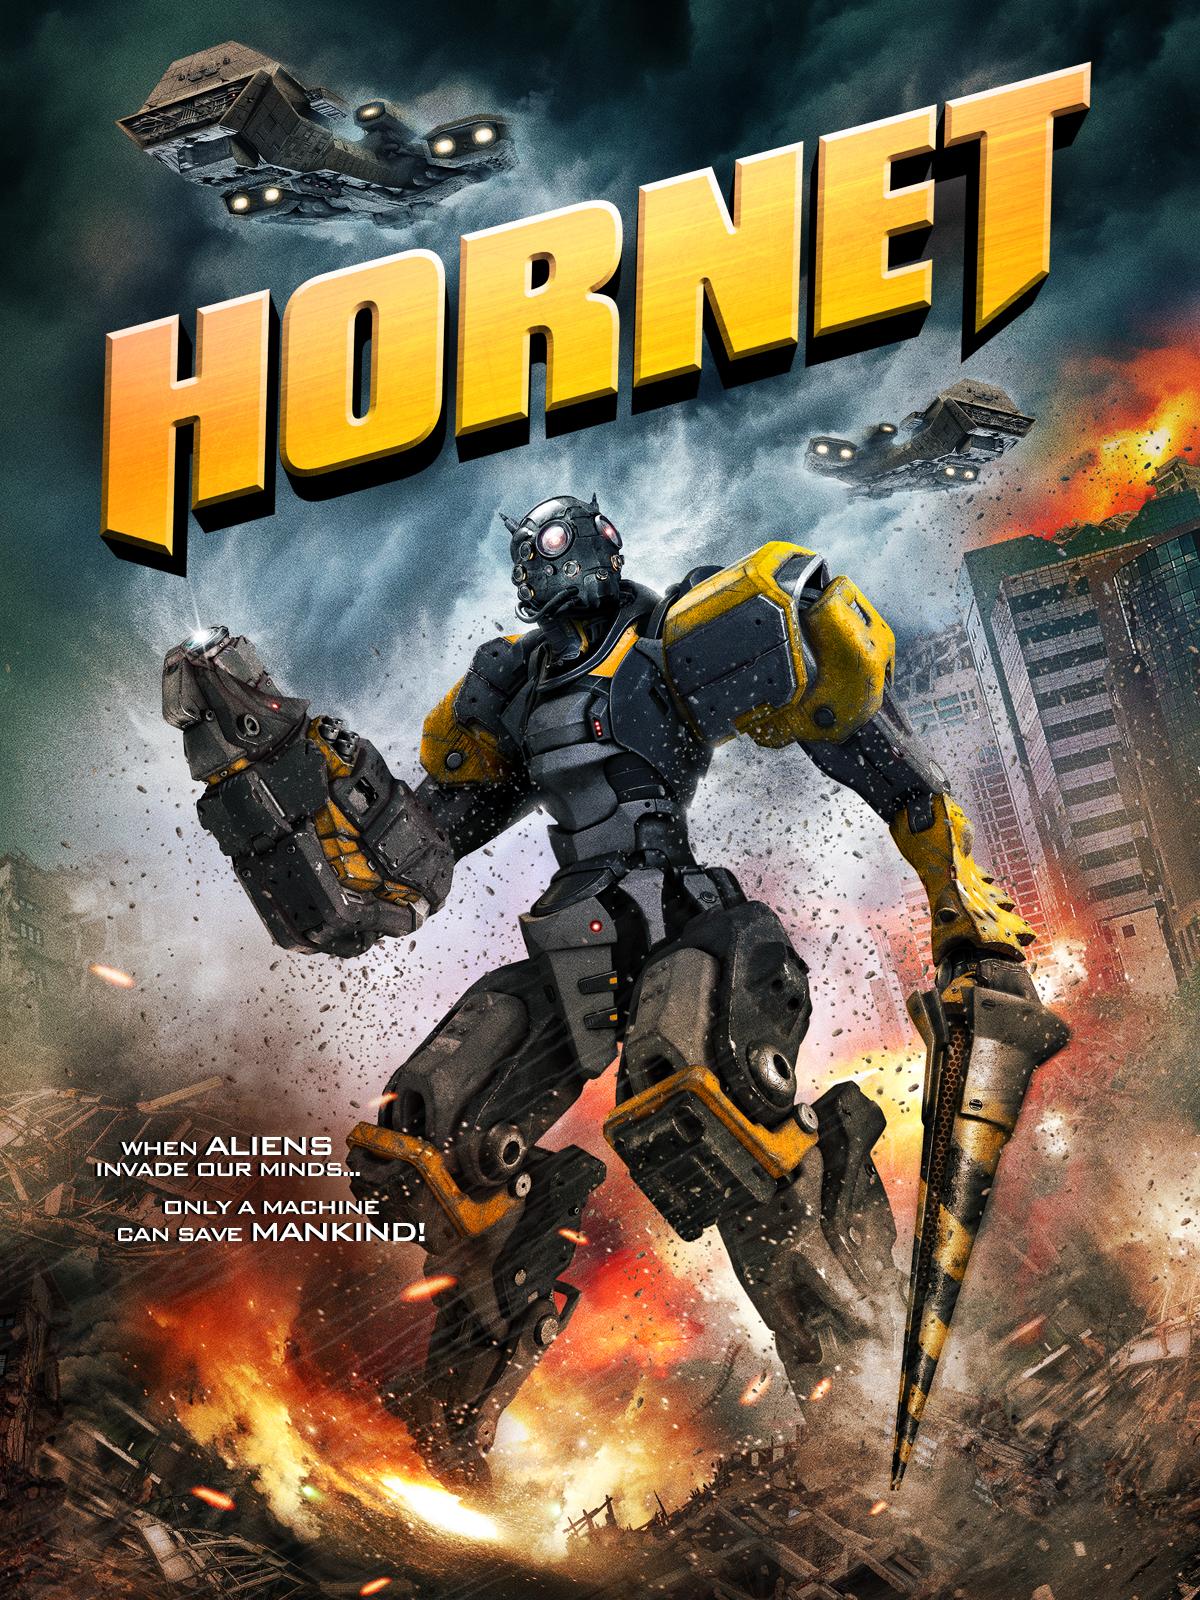 Image result for Hornet movie 2018